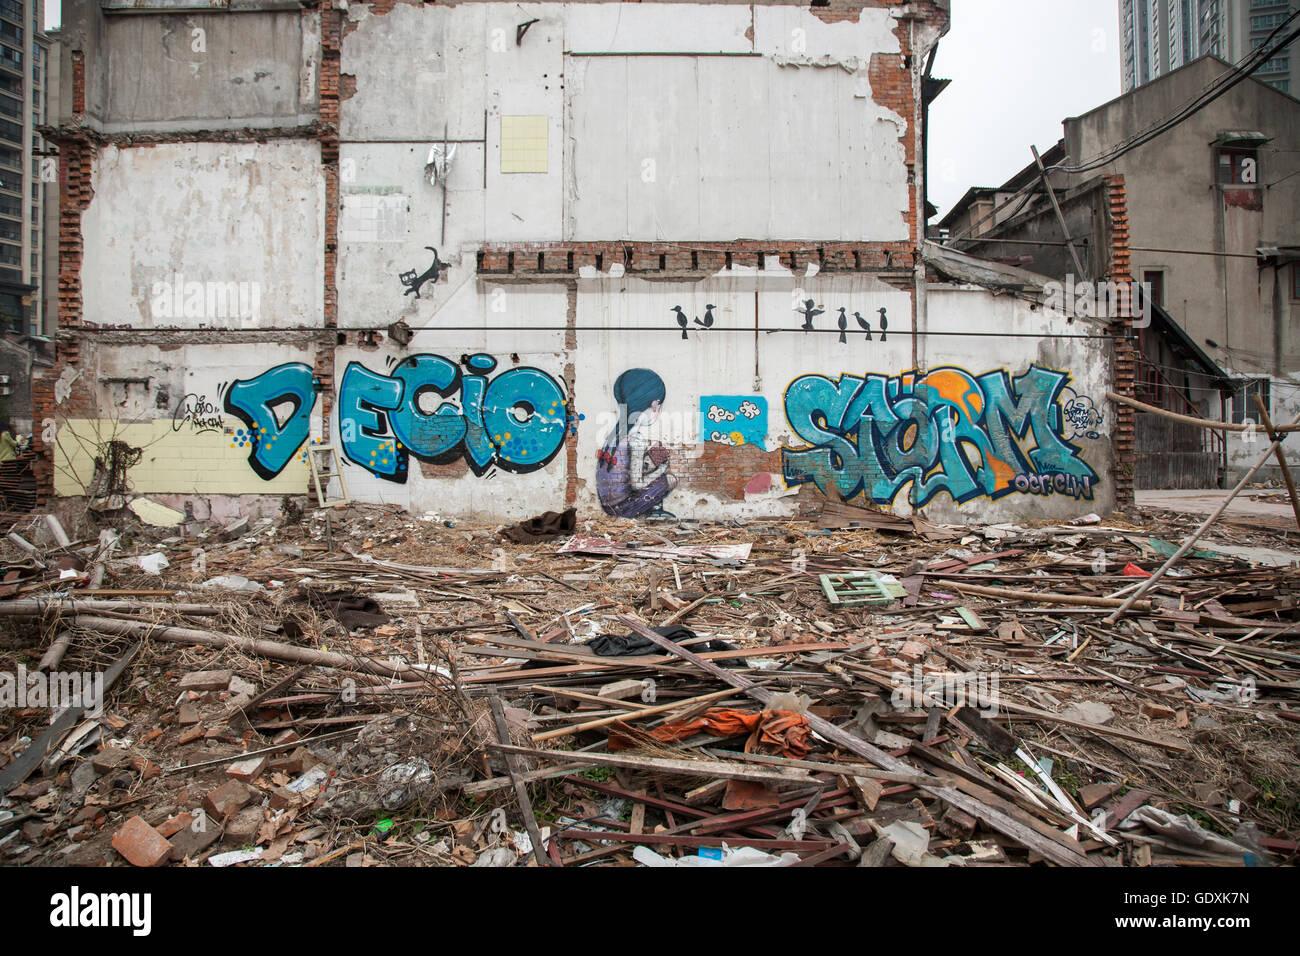 Street art on walls of demolished building. - Stock Image